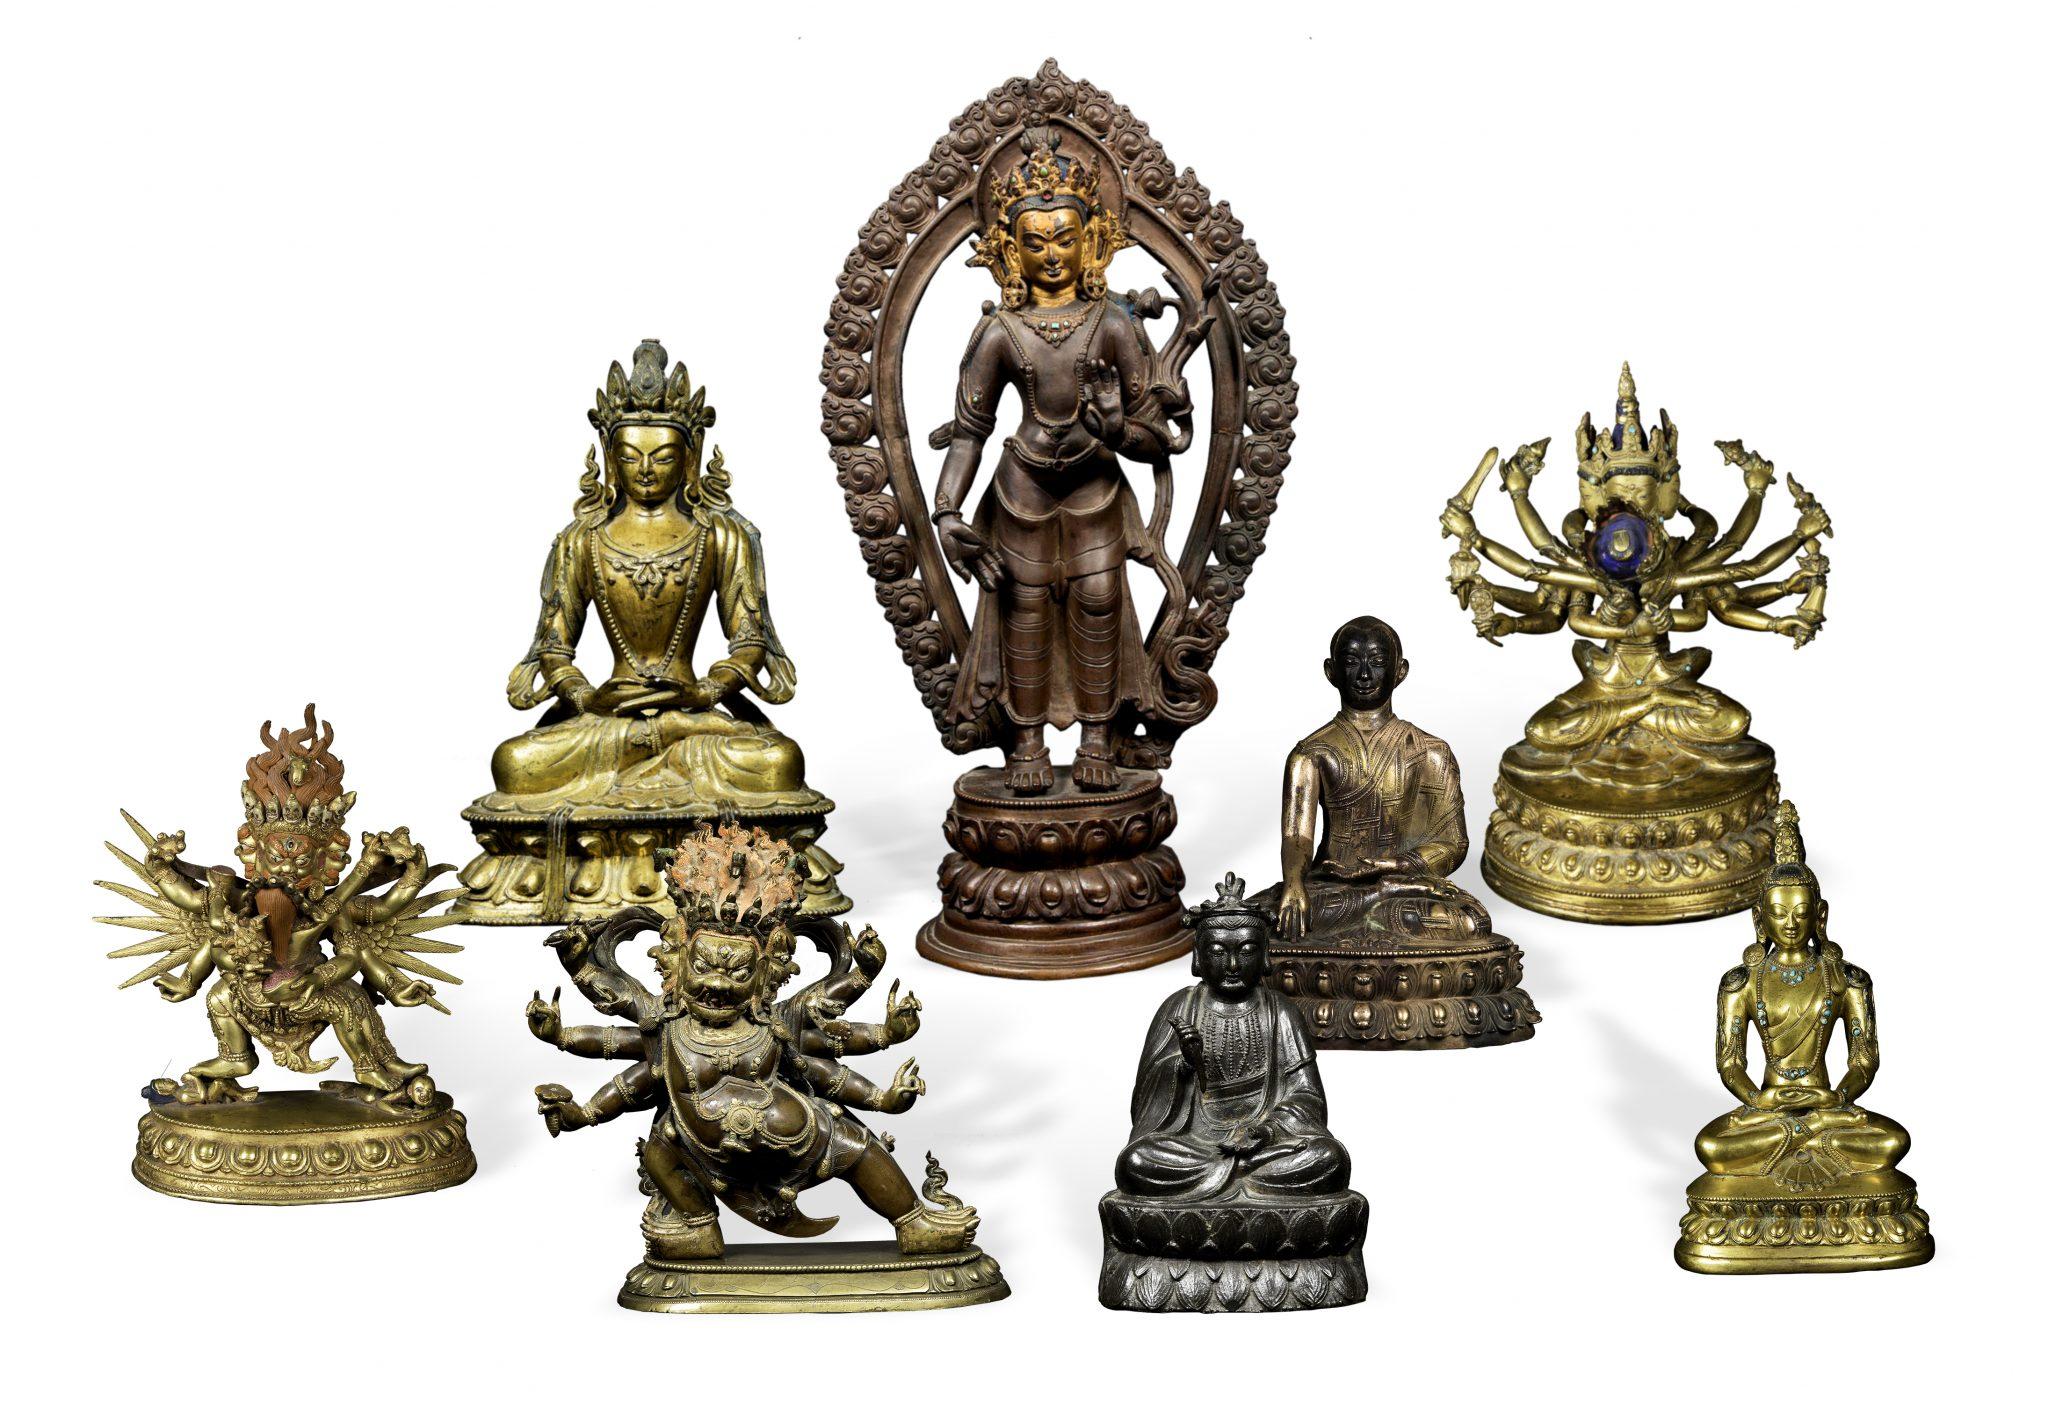 Successo da Cambi per i bronzi himalayani e cinesi